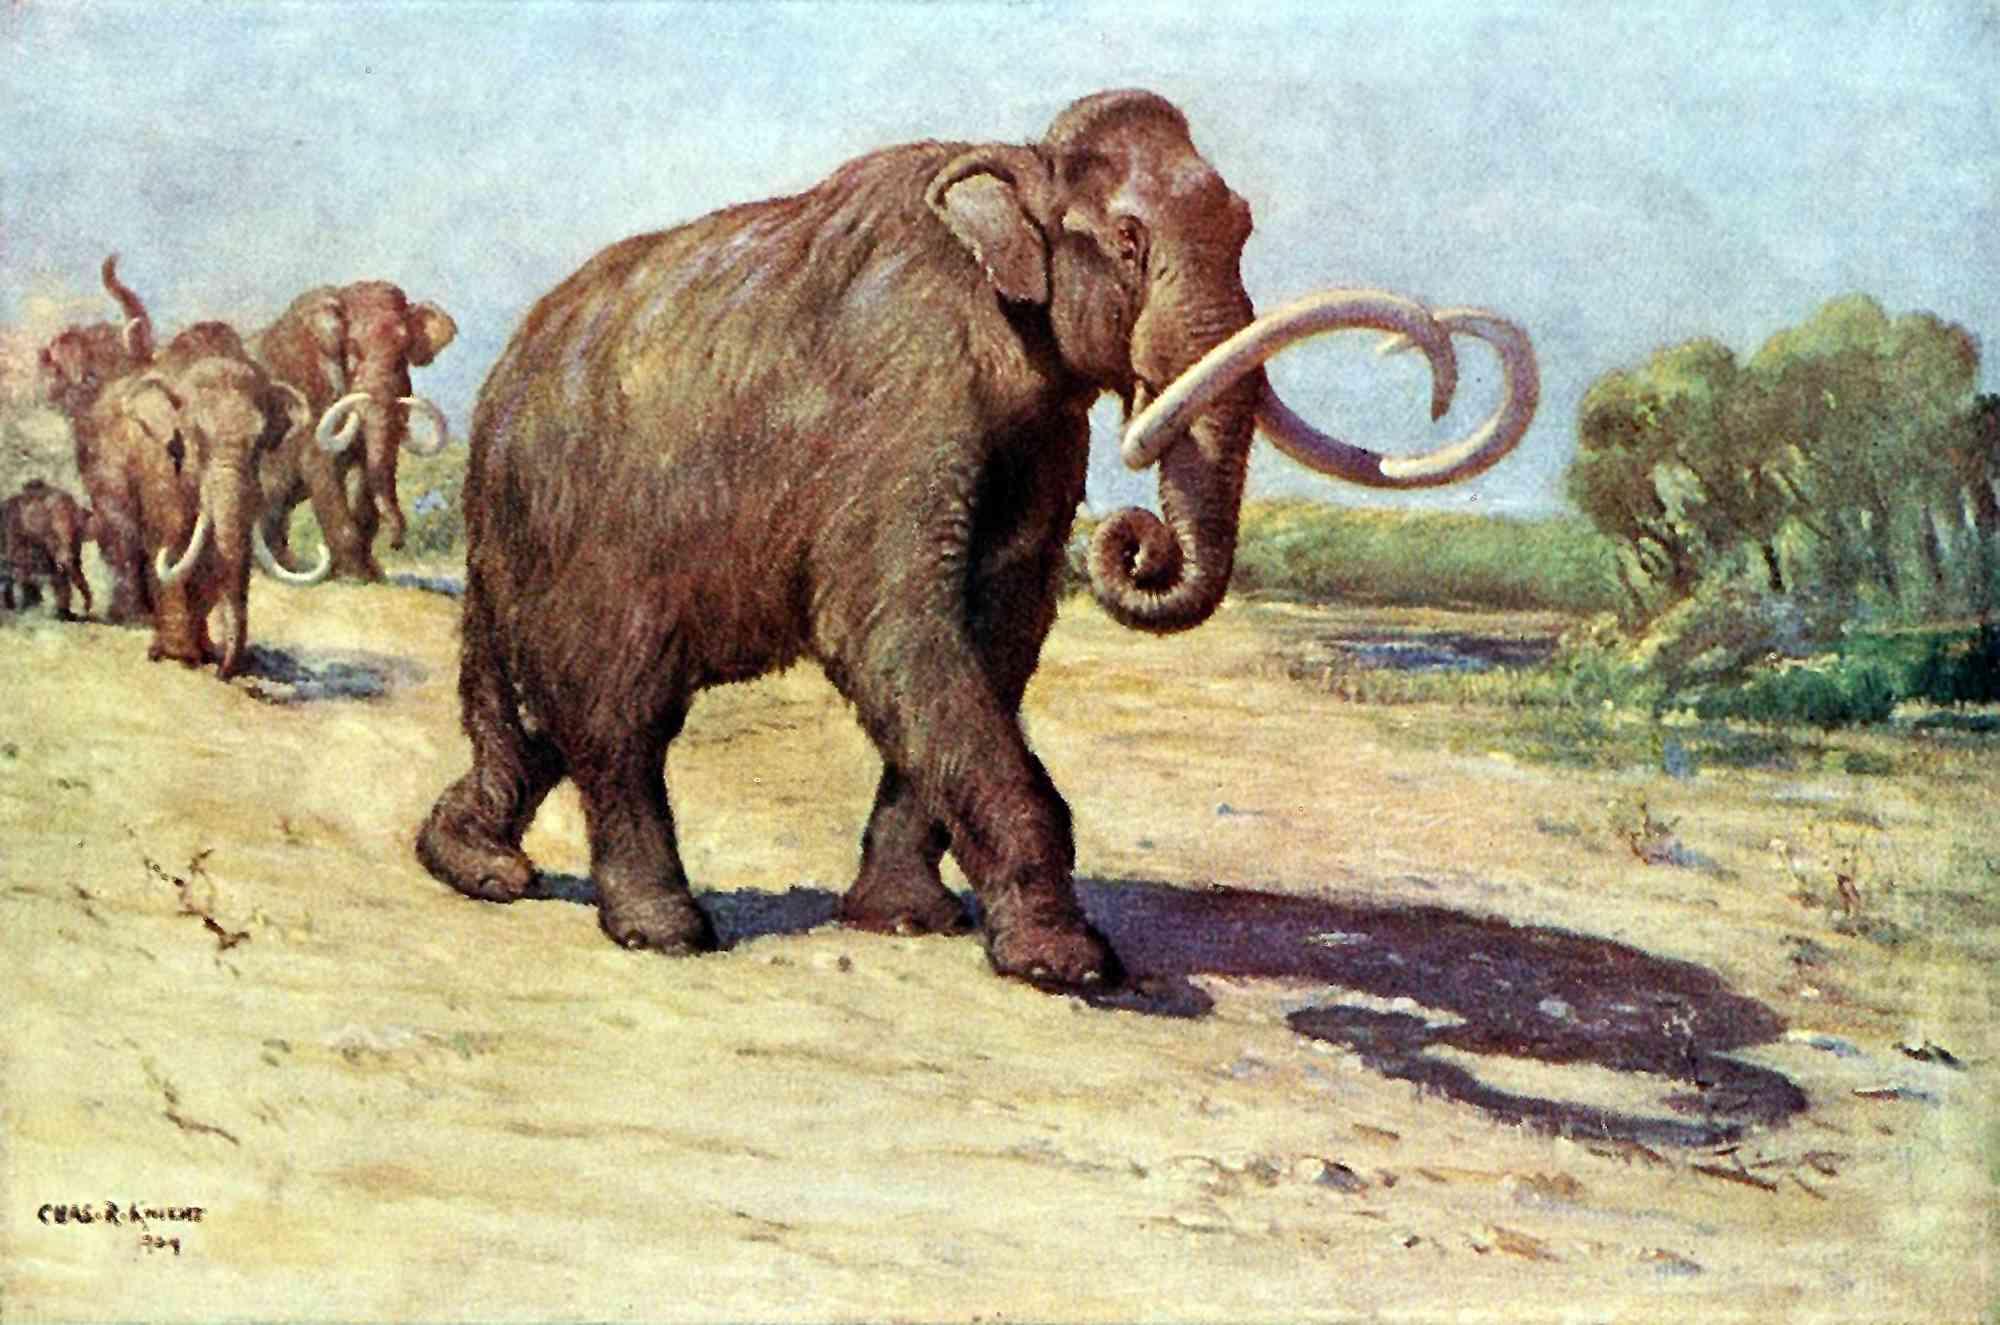 Columbian mammoth, based on the AMNH specimen